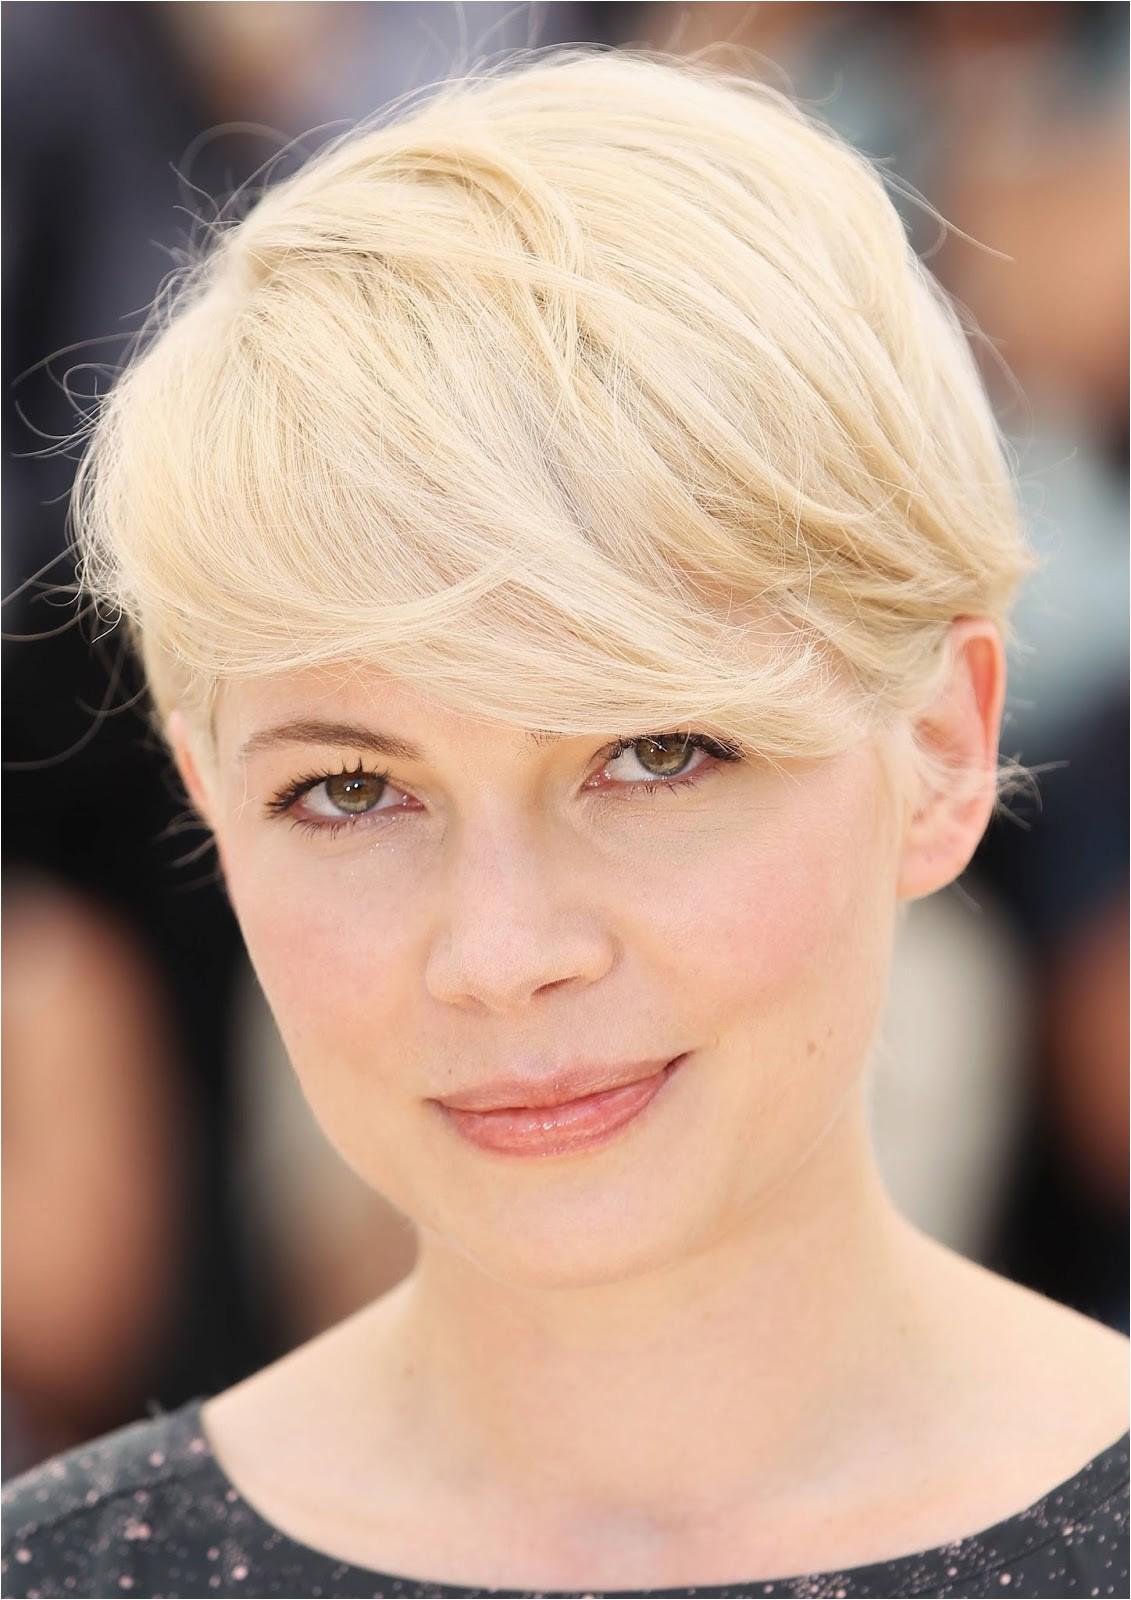 10 most beautiful women short hairstyle